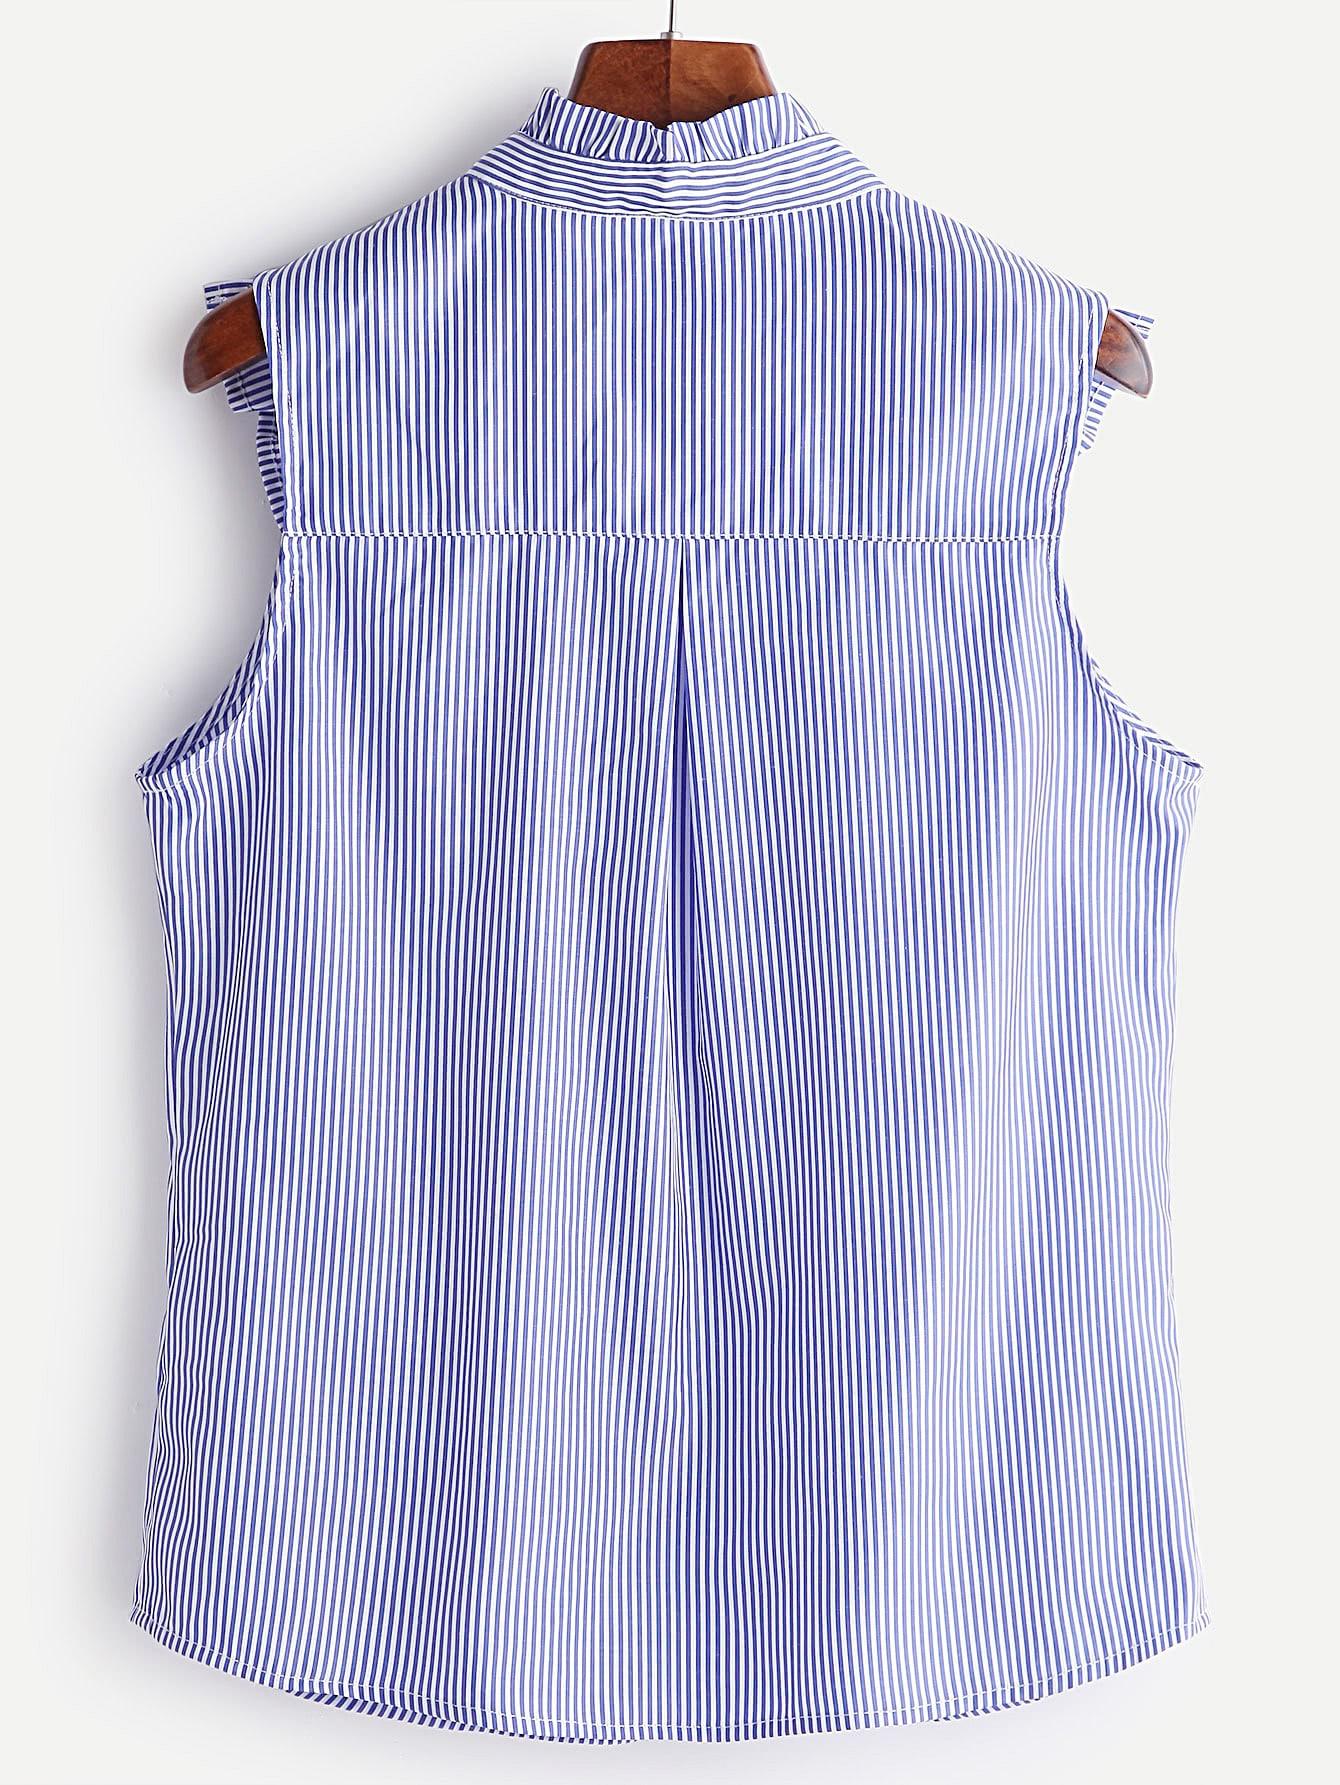 blouse170303703_2